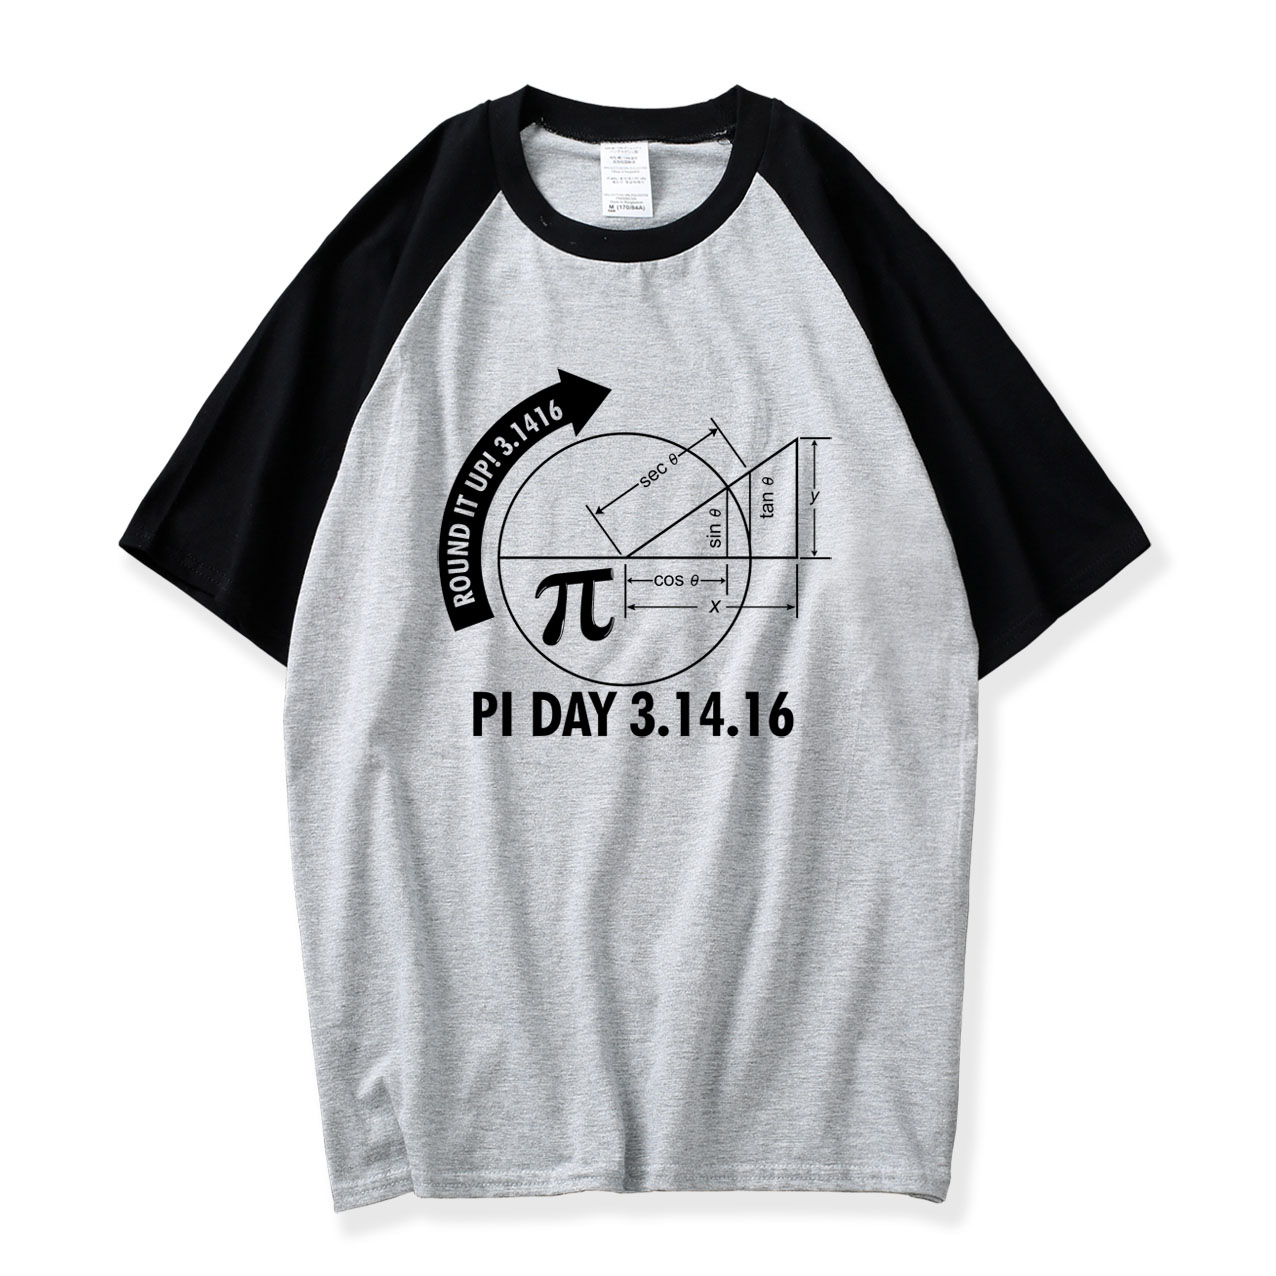 Raglan Sleeve T Shirt Men Pi Day 2016 3.1416 Round It Up Math Graph Stem T-Shirt 2018 New Summer 100% Cotton O Neck Mens Tshirts